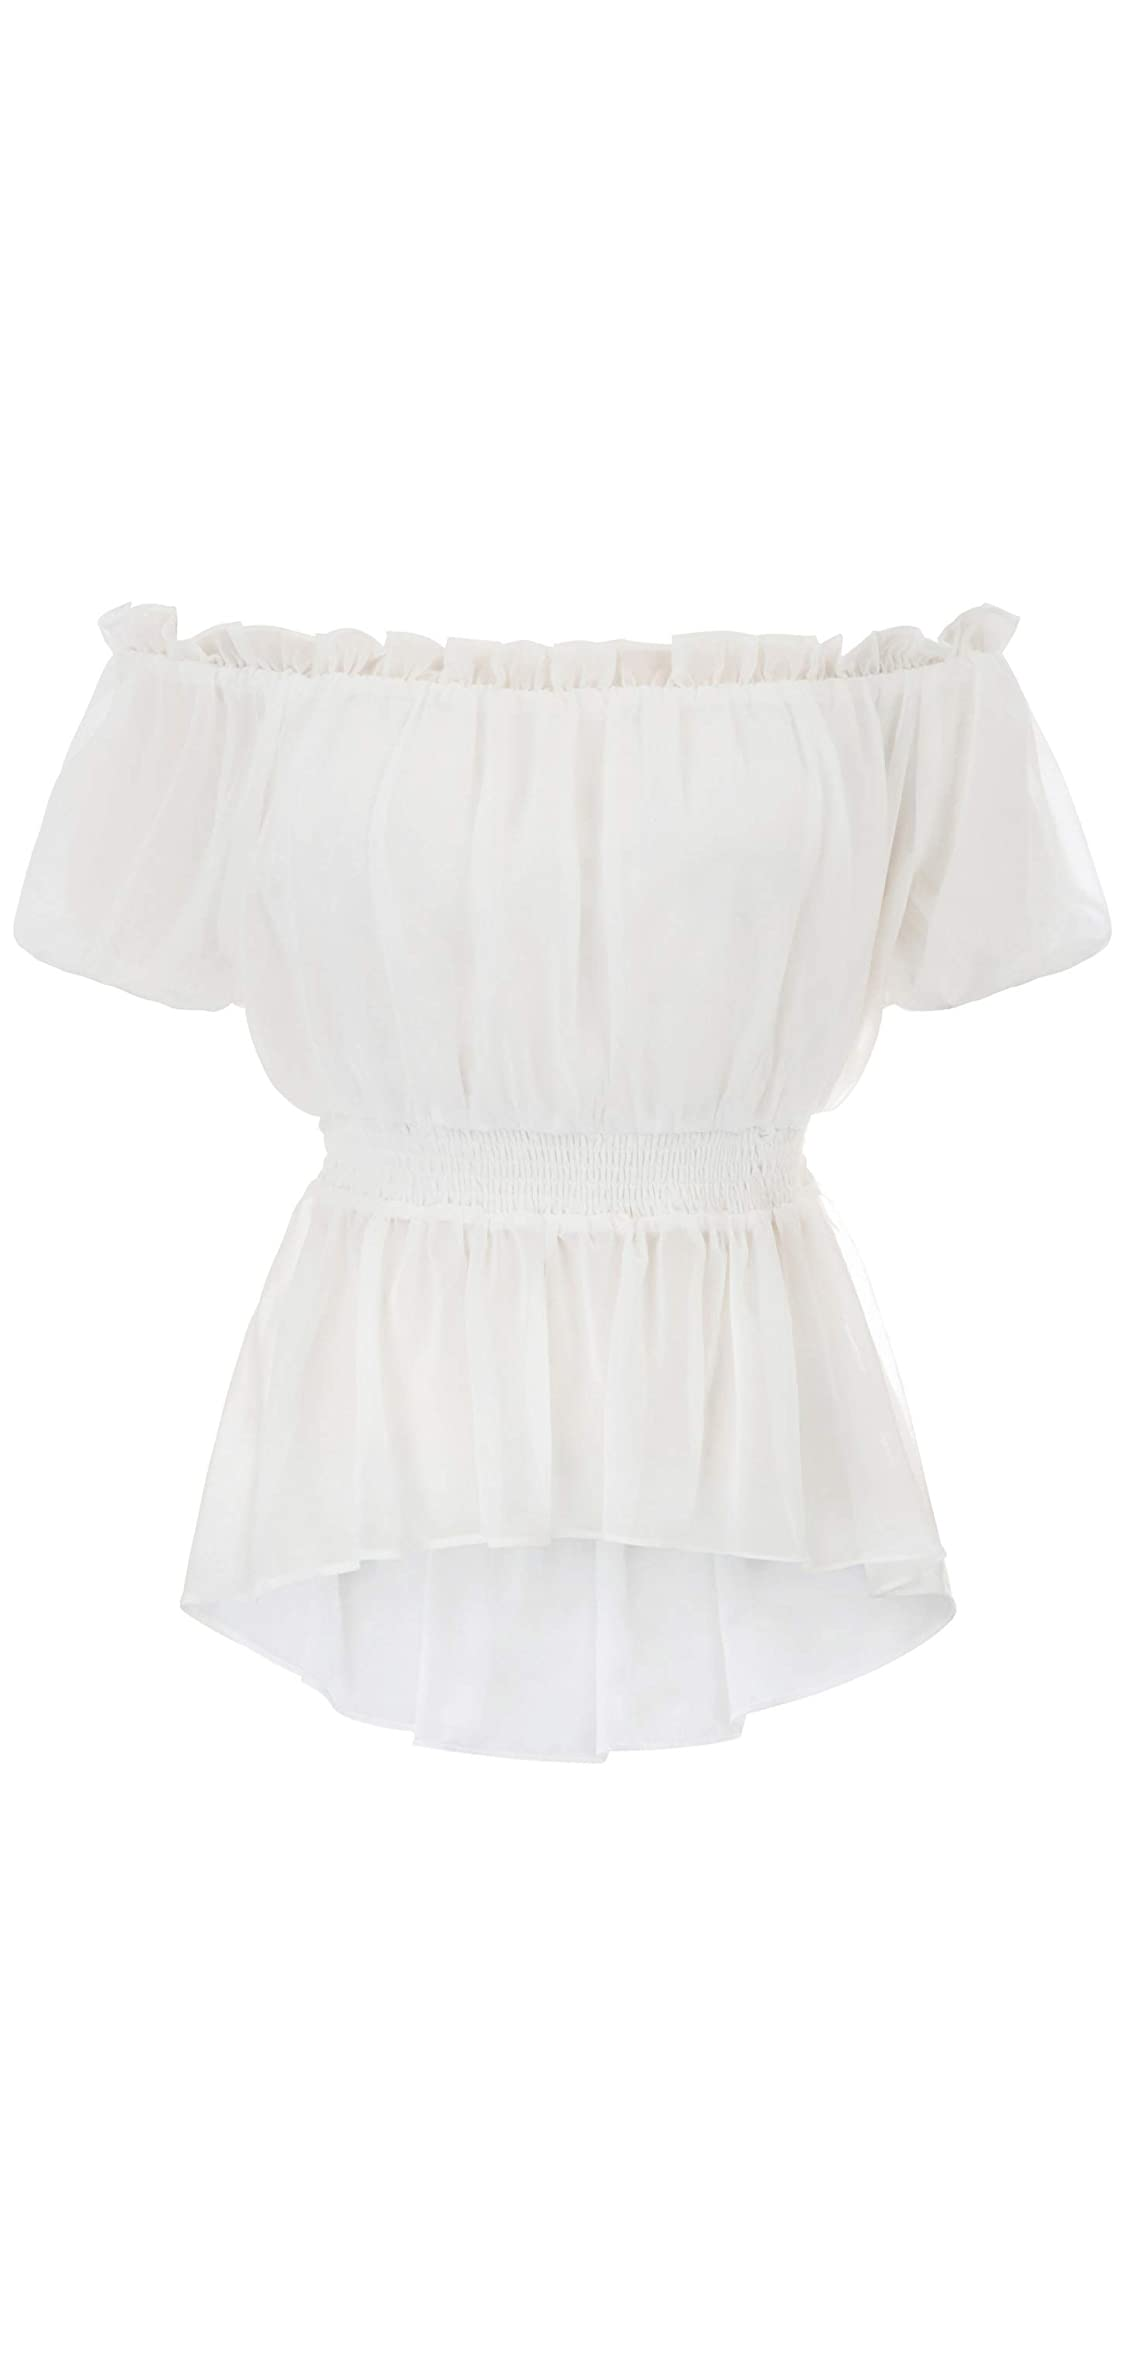 Womens Renaissance Shirt Short Sleeve Ruffled Off Shoulder Boho